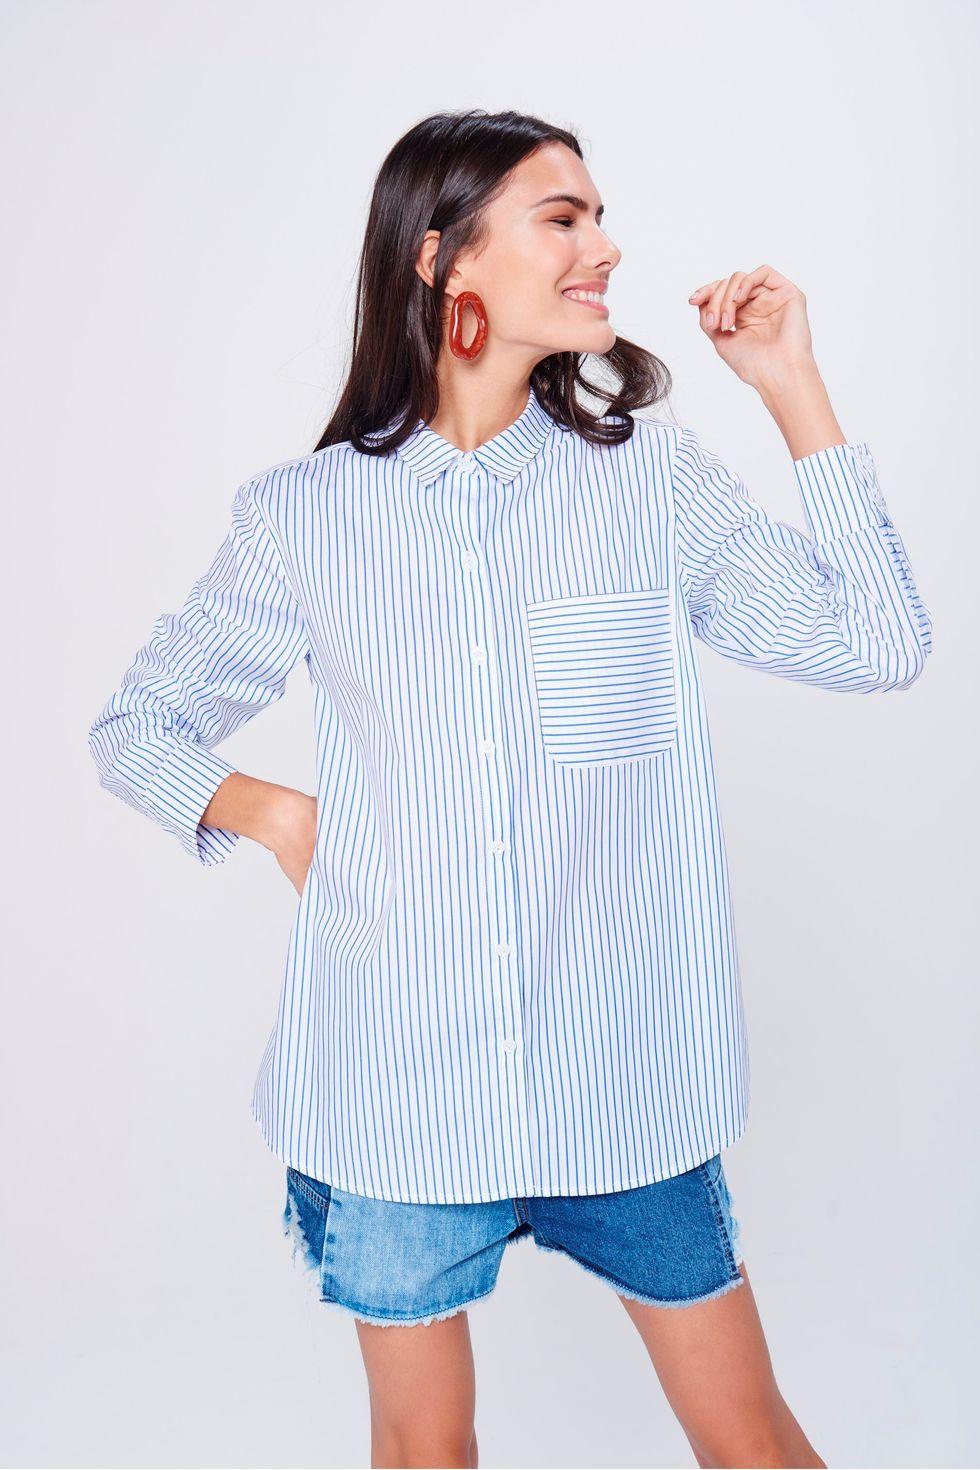 Camisa-Listrada-Feminina-Frente--